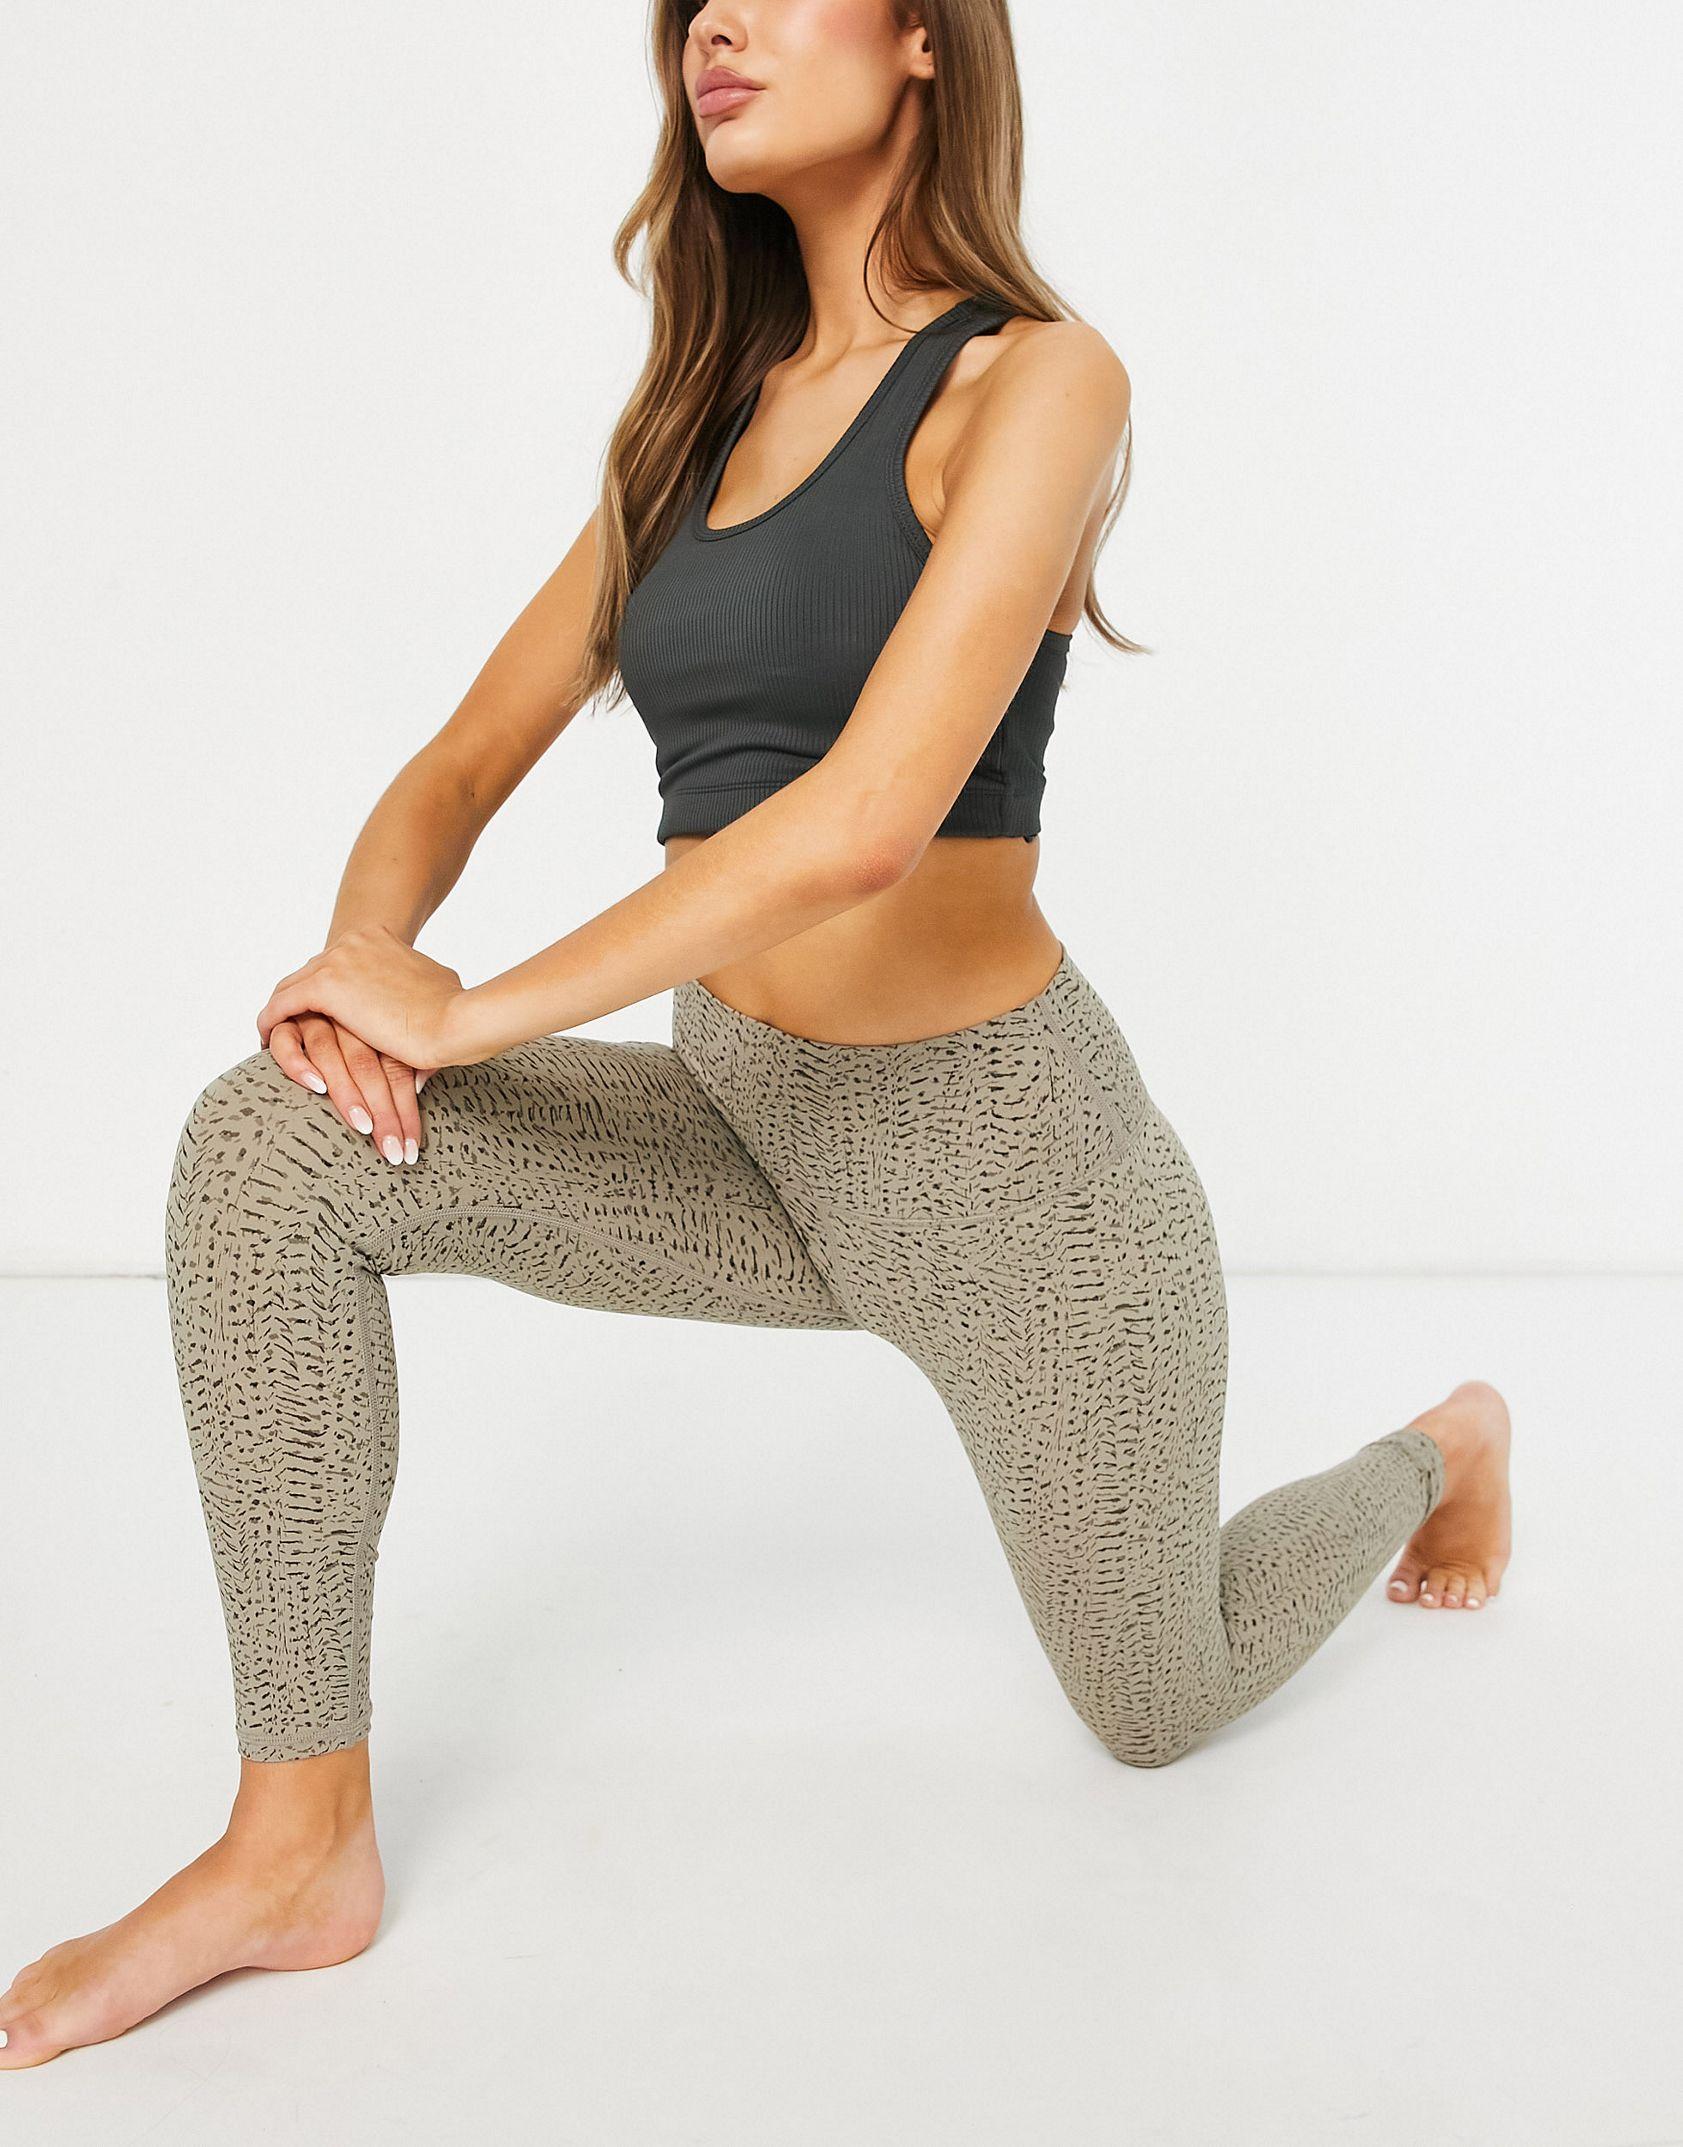 Varley Luna leggings in taupe -  Price Checker